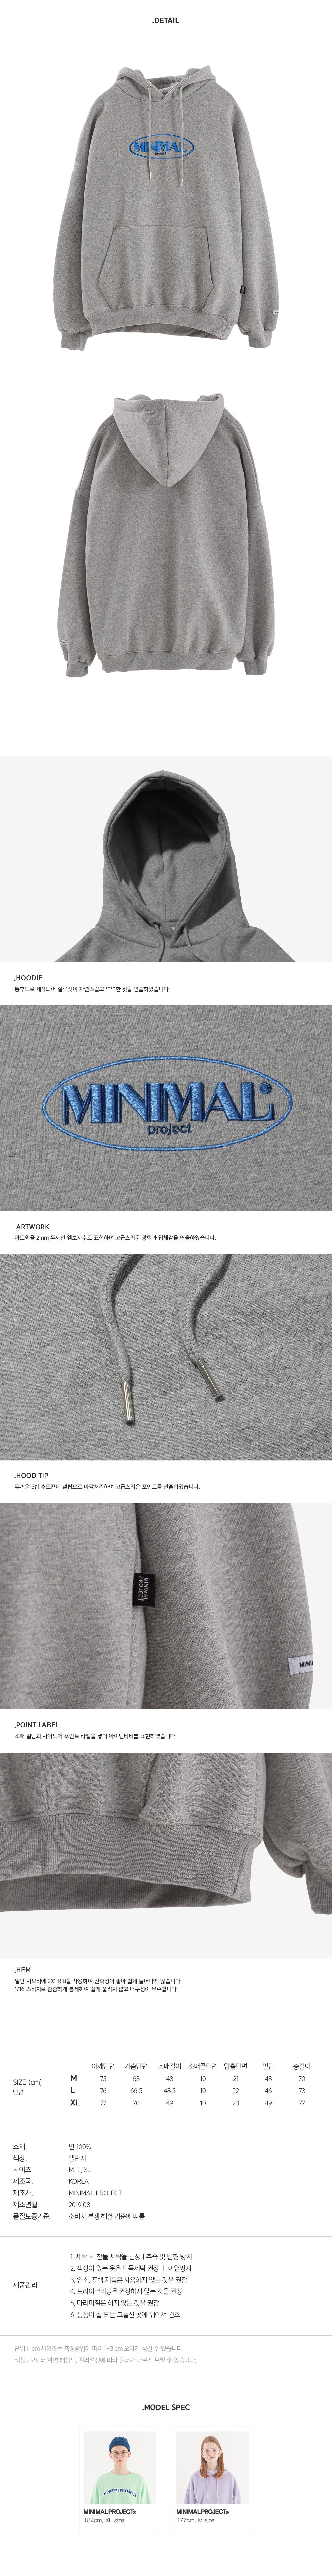 [minimal project] 미니멀프로젝트 미니멀 엠보 자수 오버핏 후드 MHT103 [MELANGE]